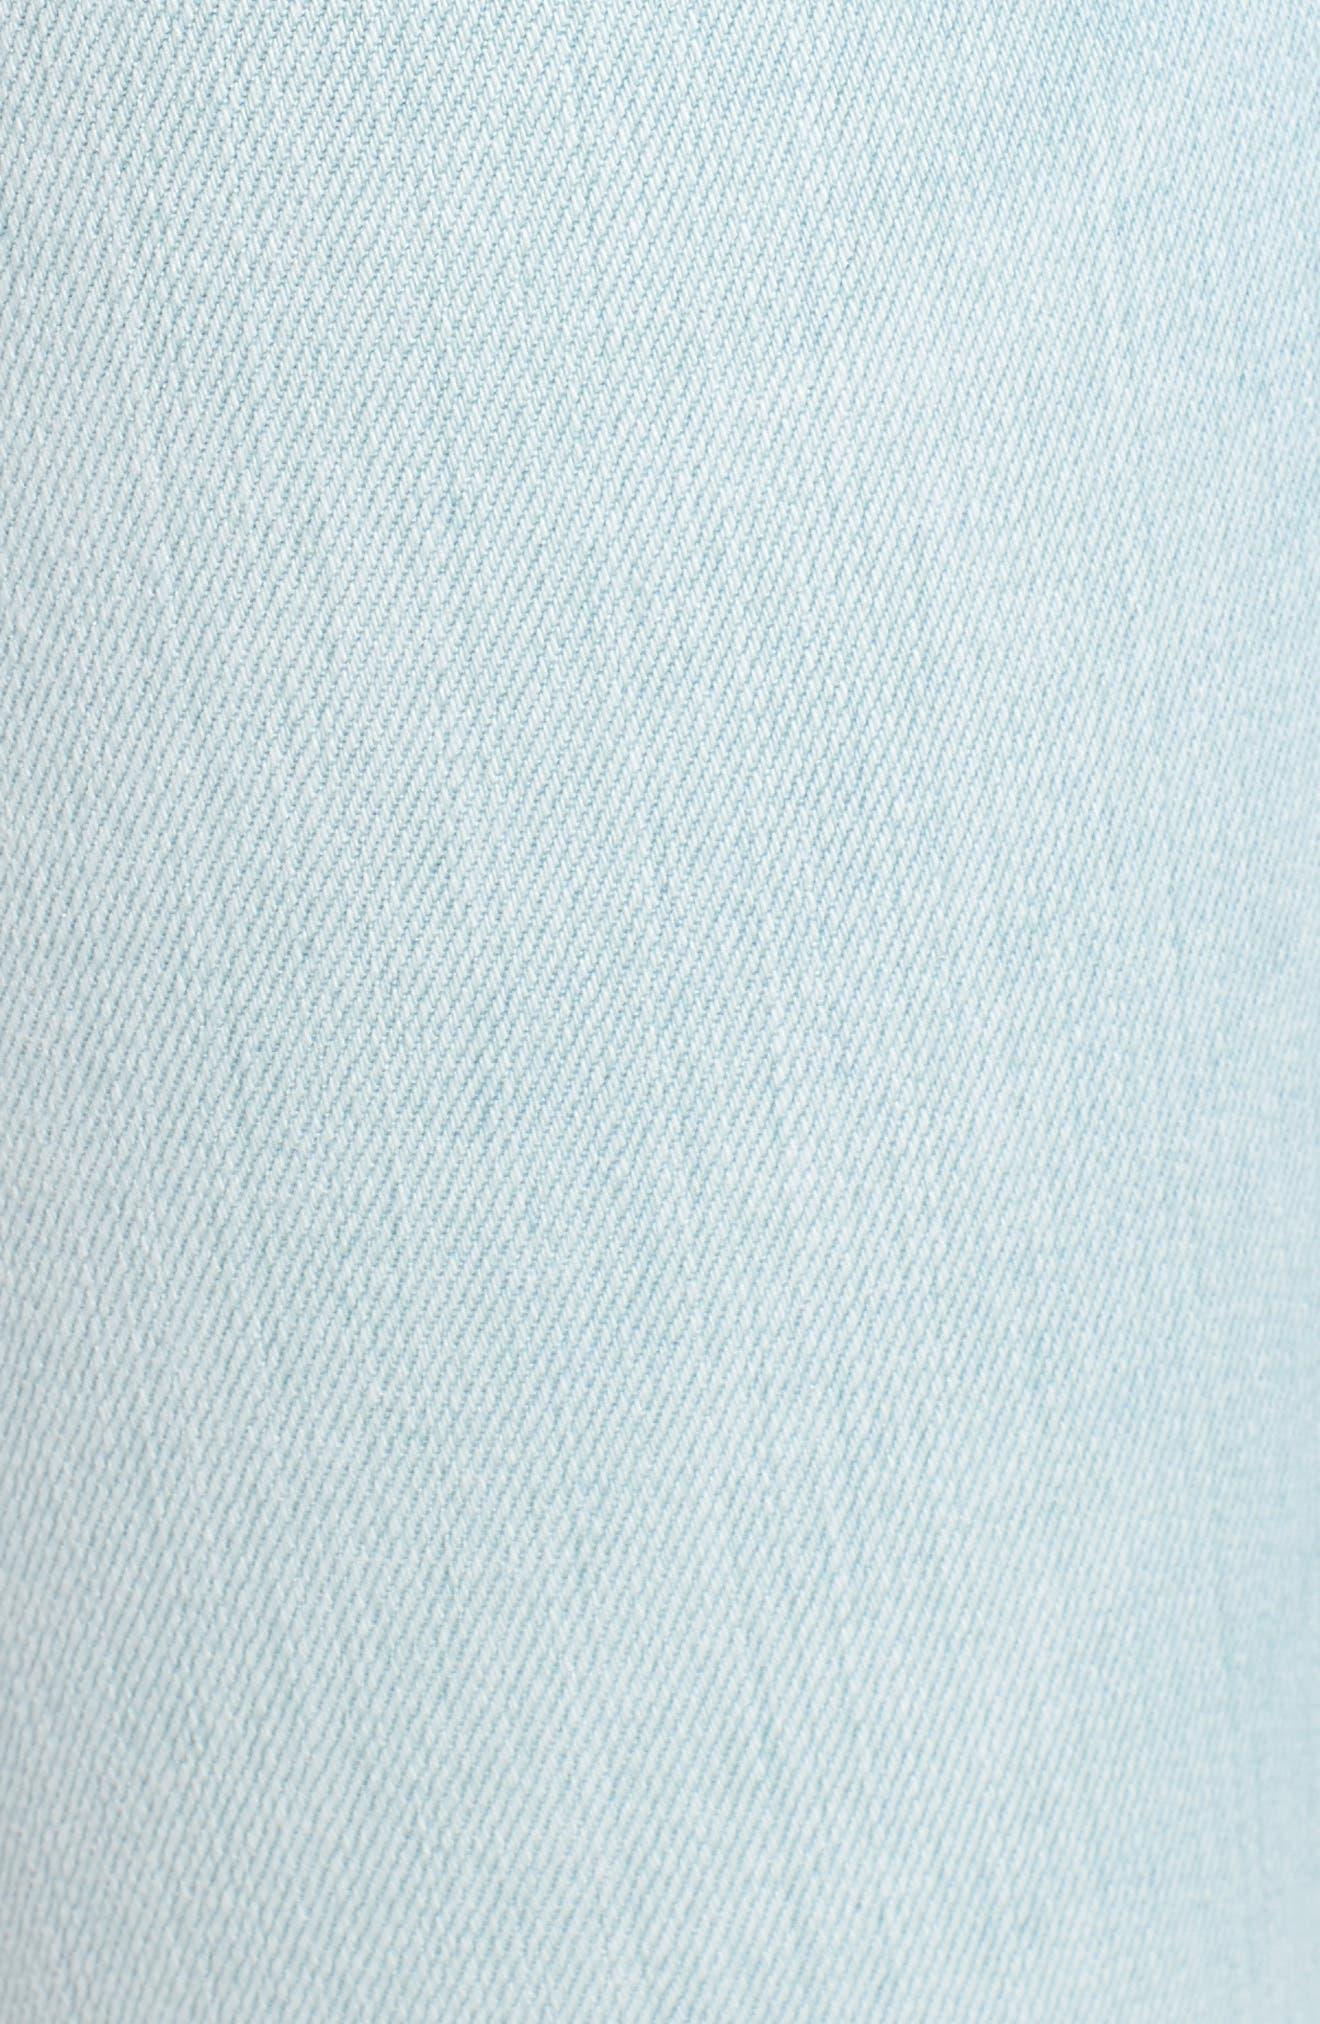 Krista Ankle Super Skinny Jeans,                             Alternate thumbnail 6, color,                             In Love